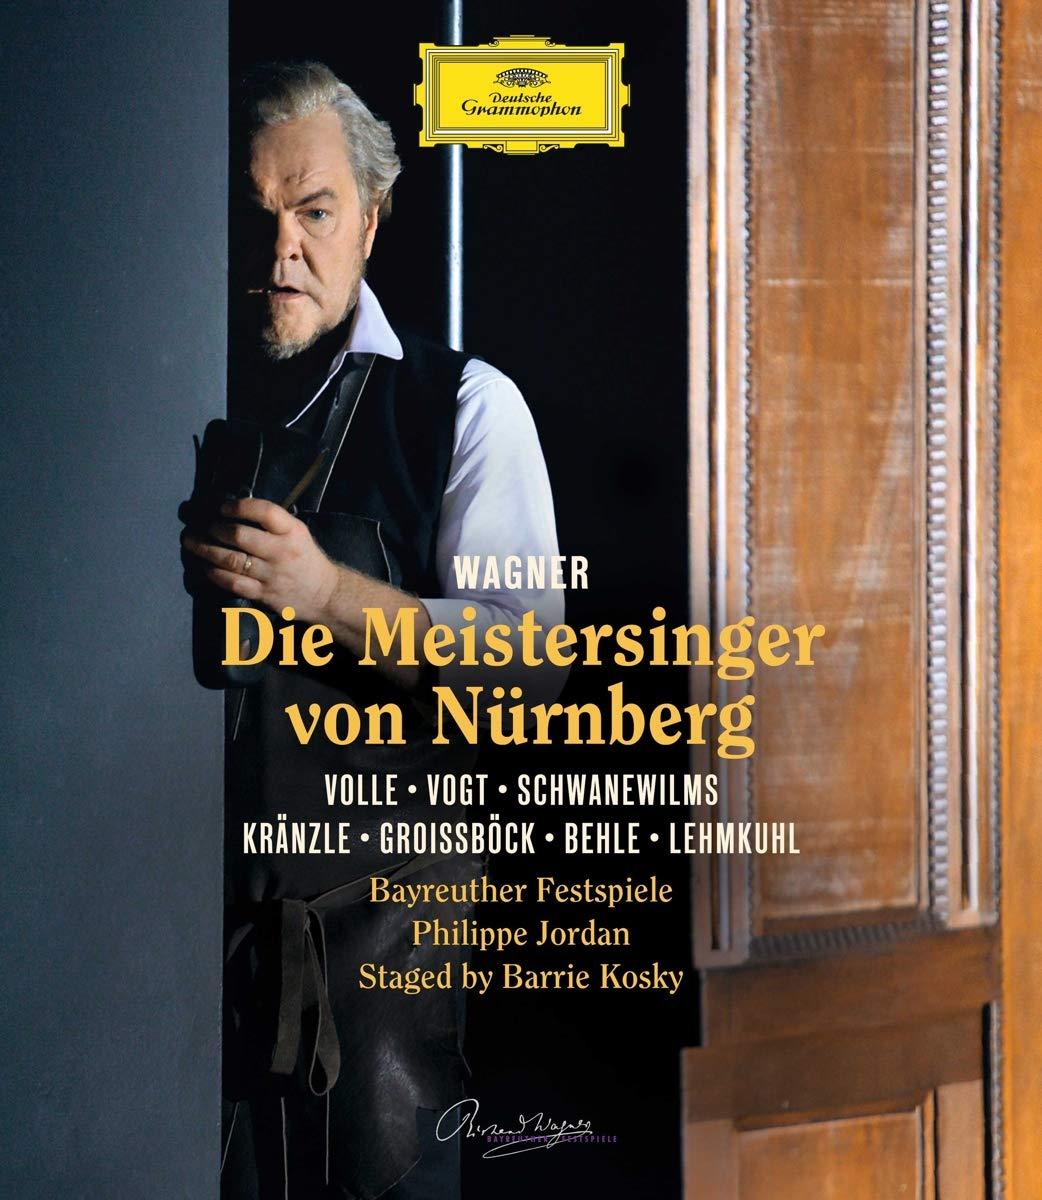 Dealing full Fixed price for sale price reduction Die Meistersinger Nurnberg Von